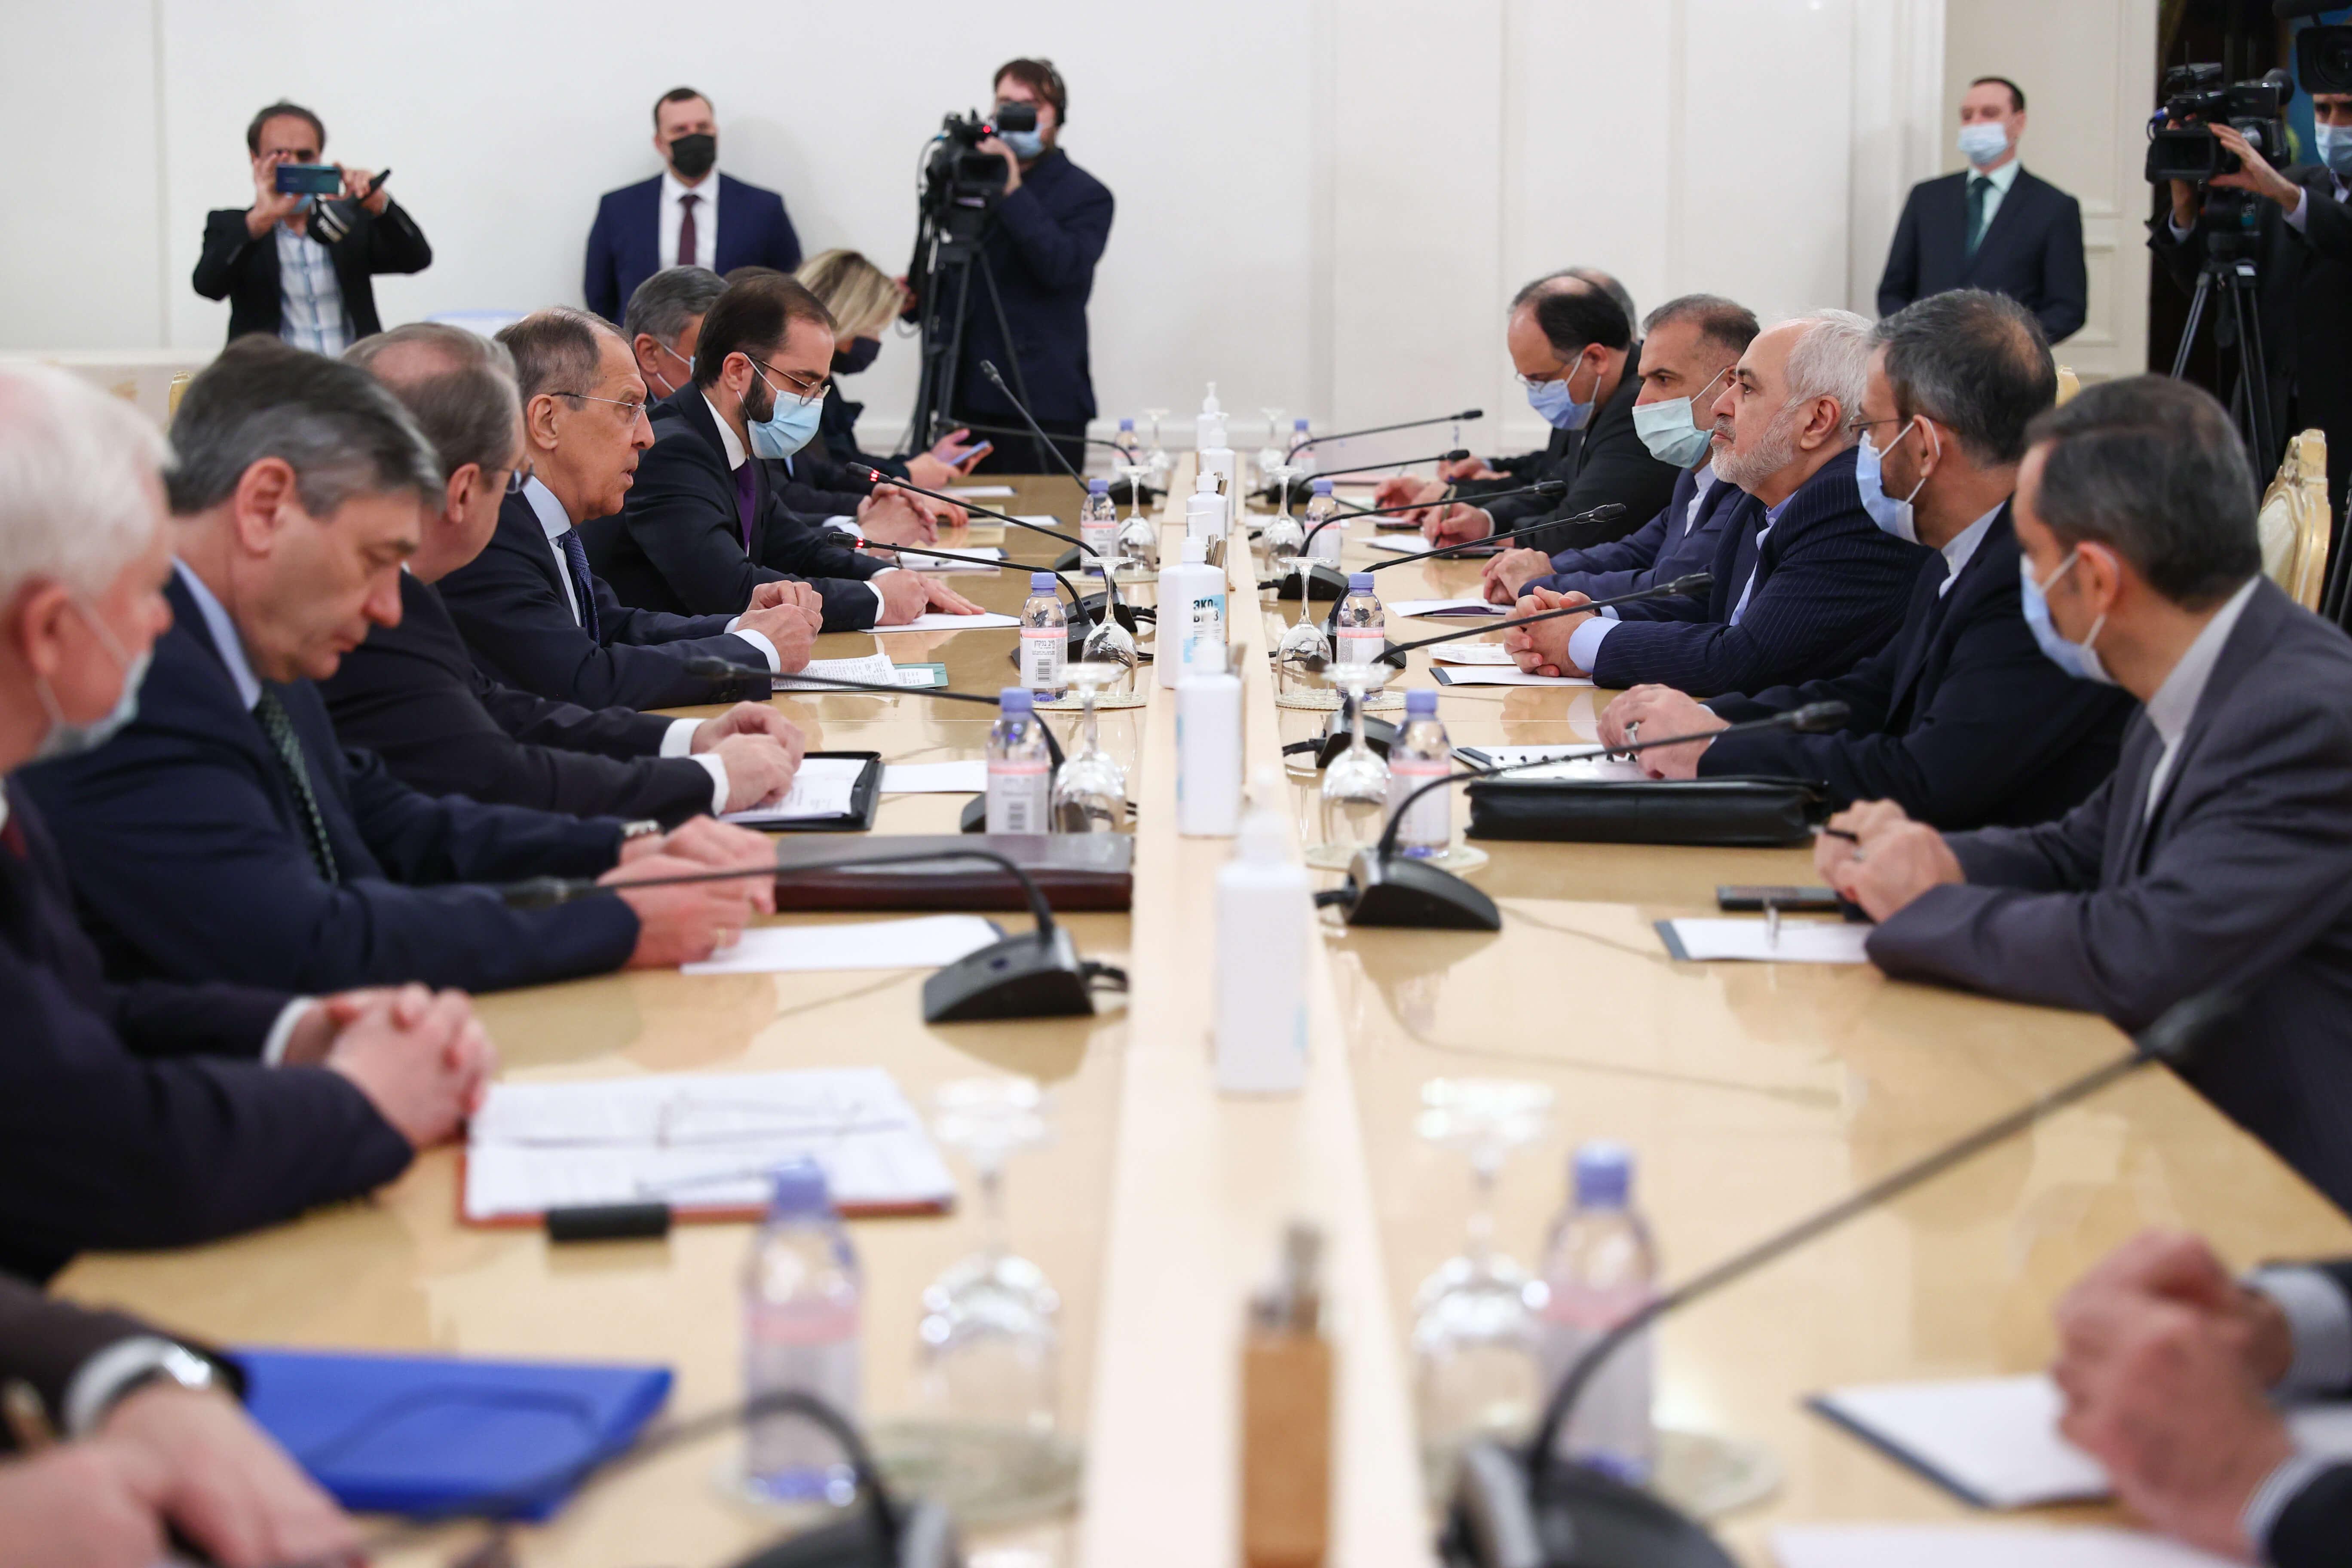 MFA Russia/ Global Look Press